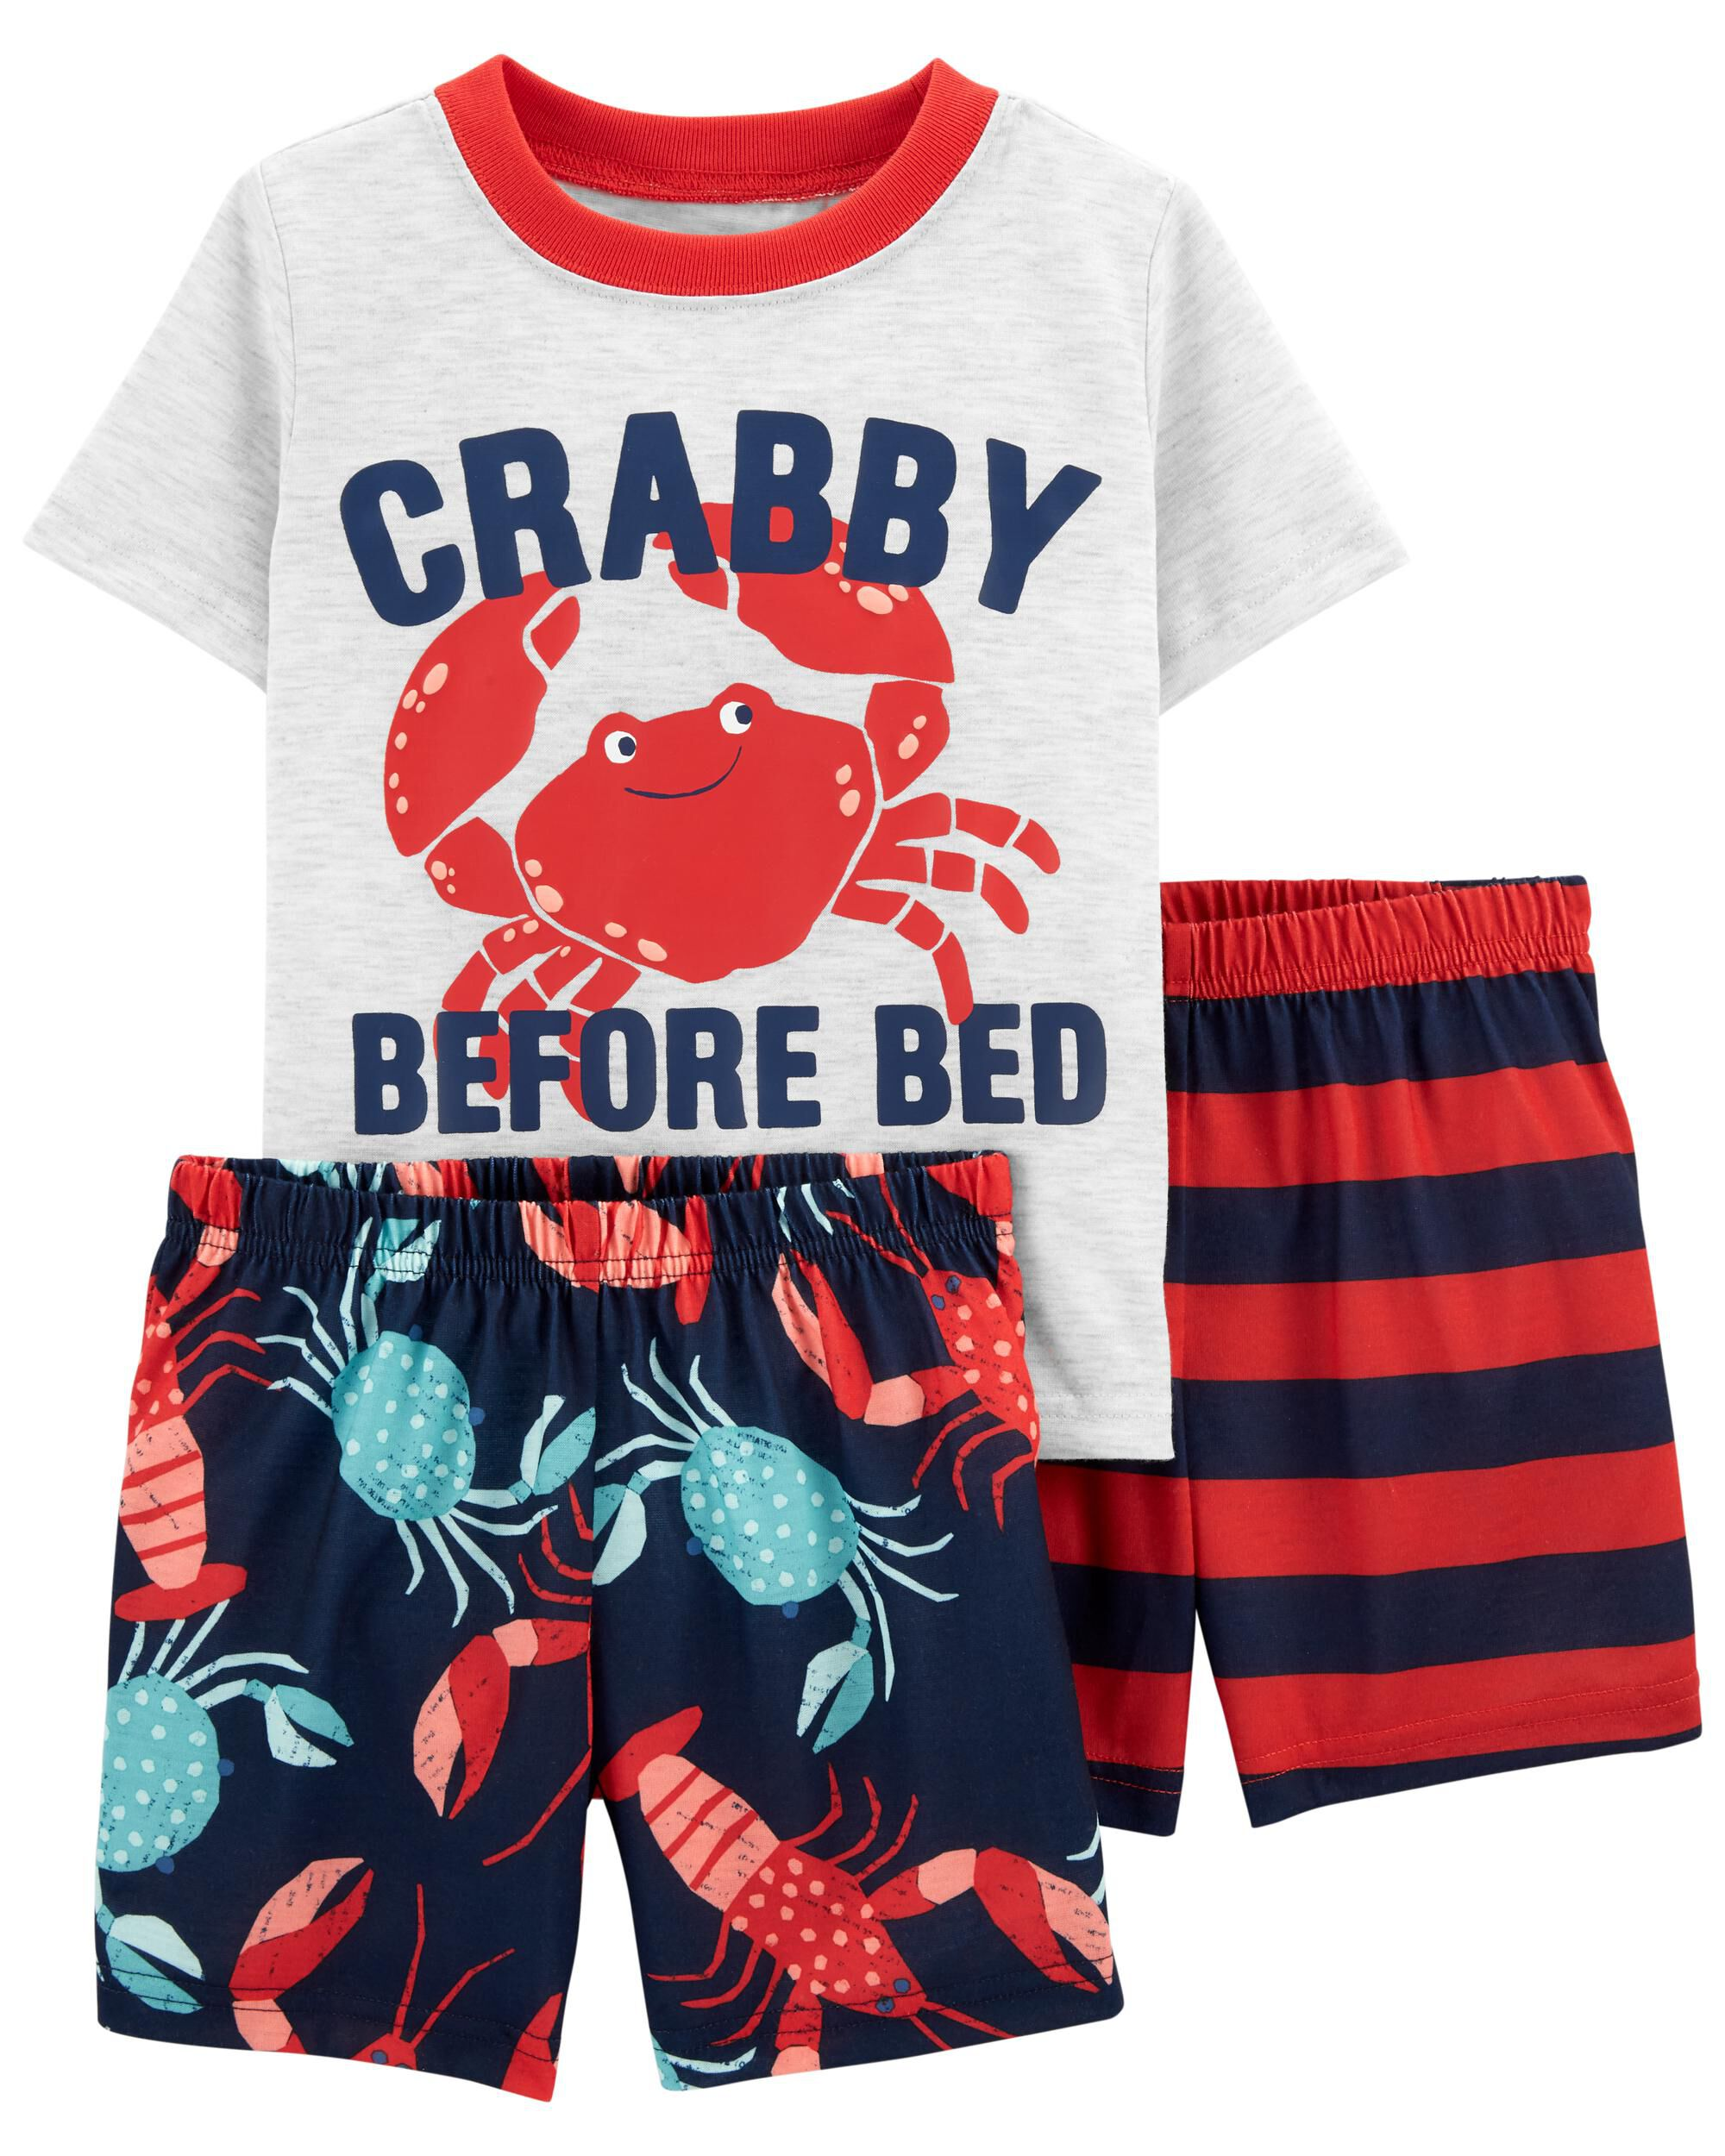 3-Piece Crab Loose Fit PJs